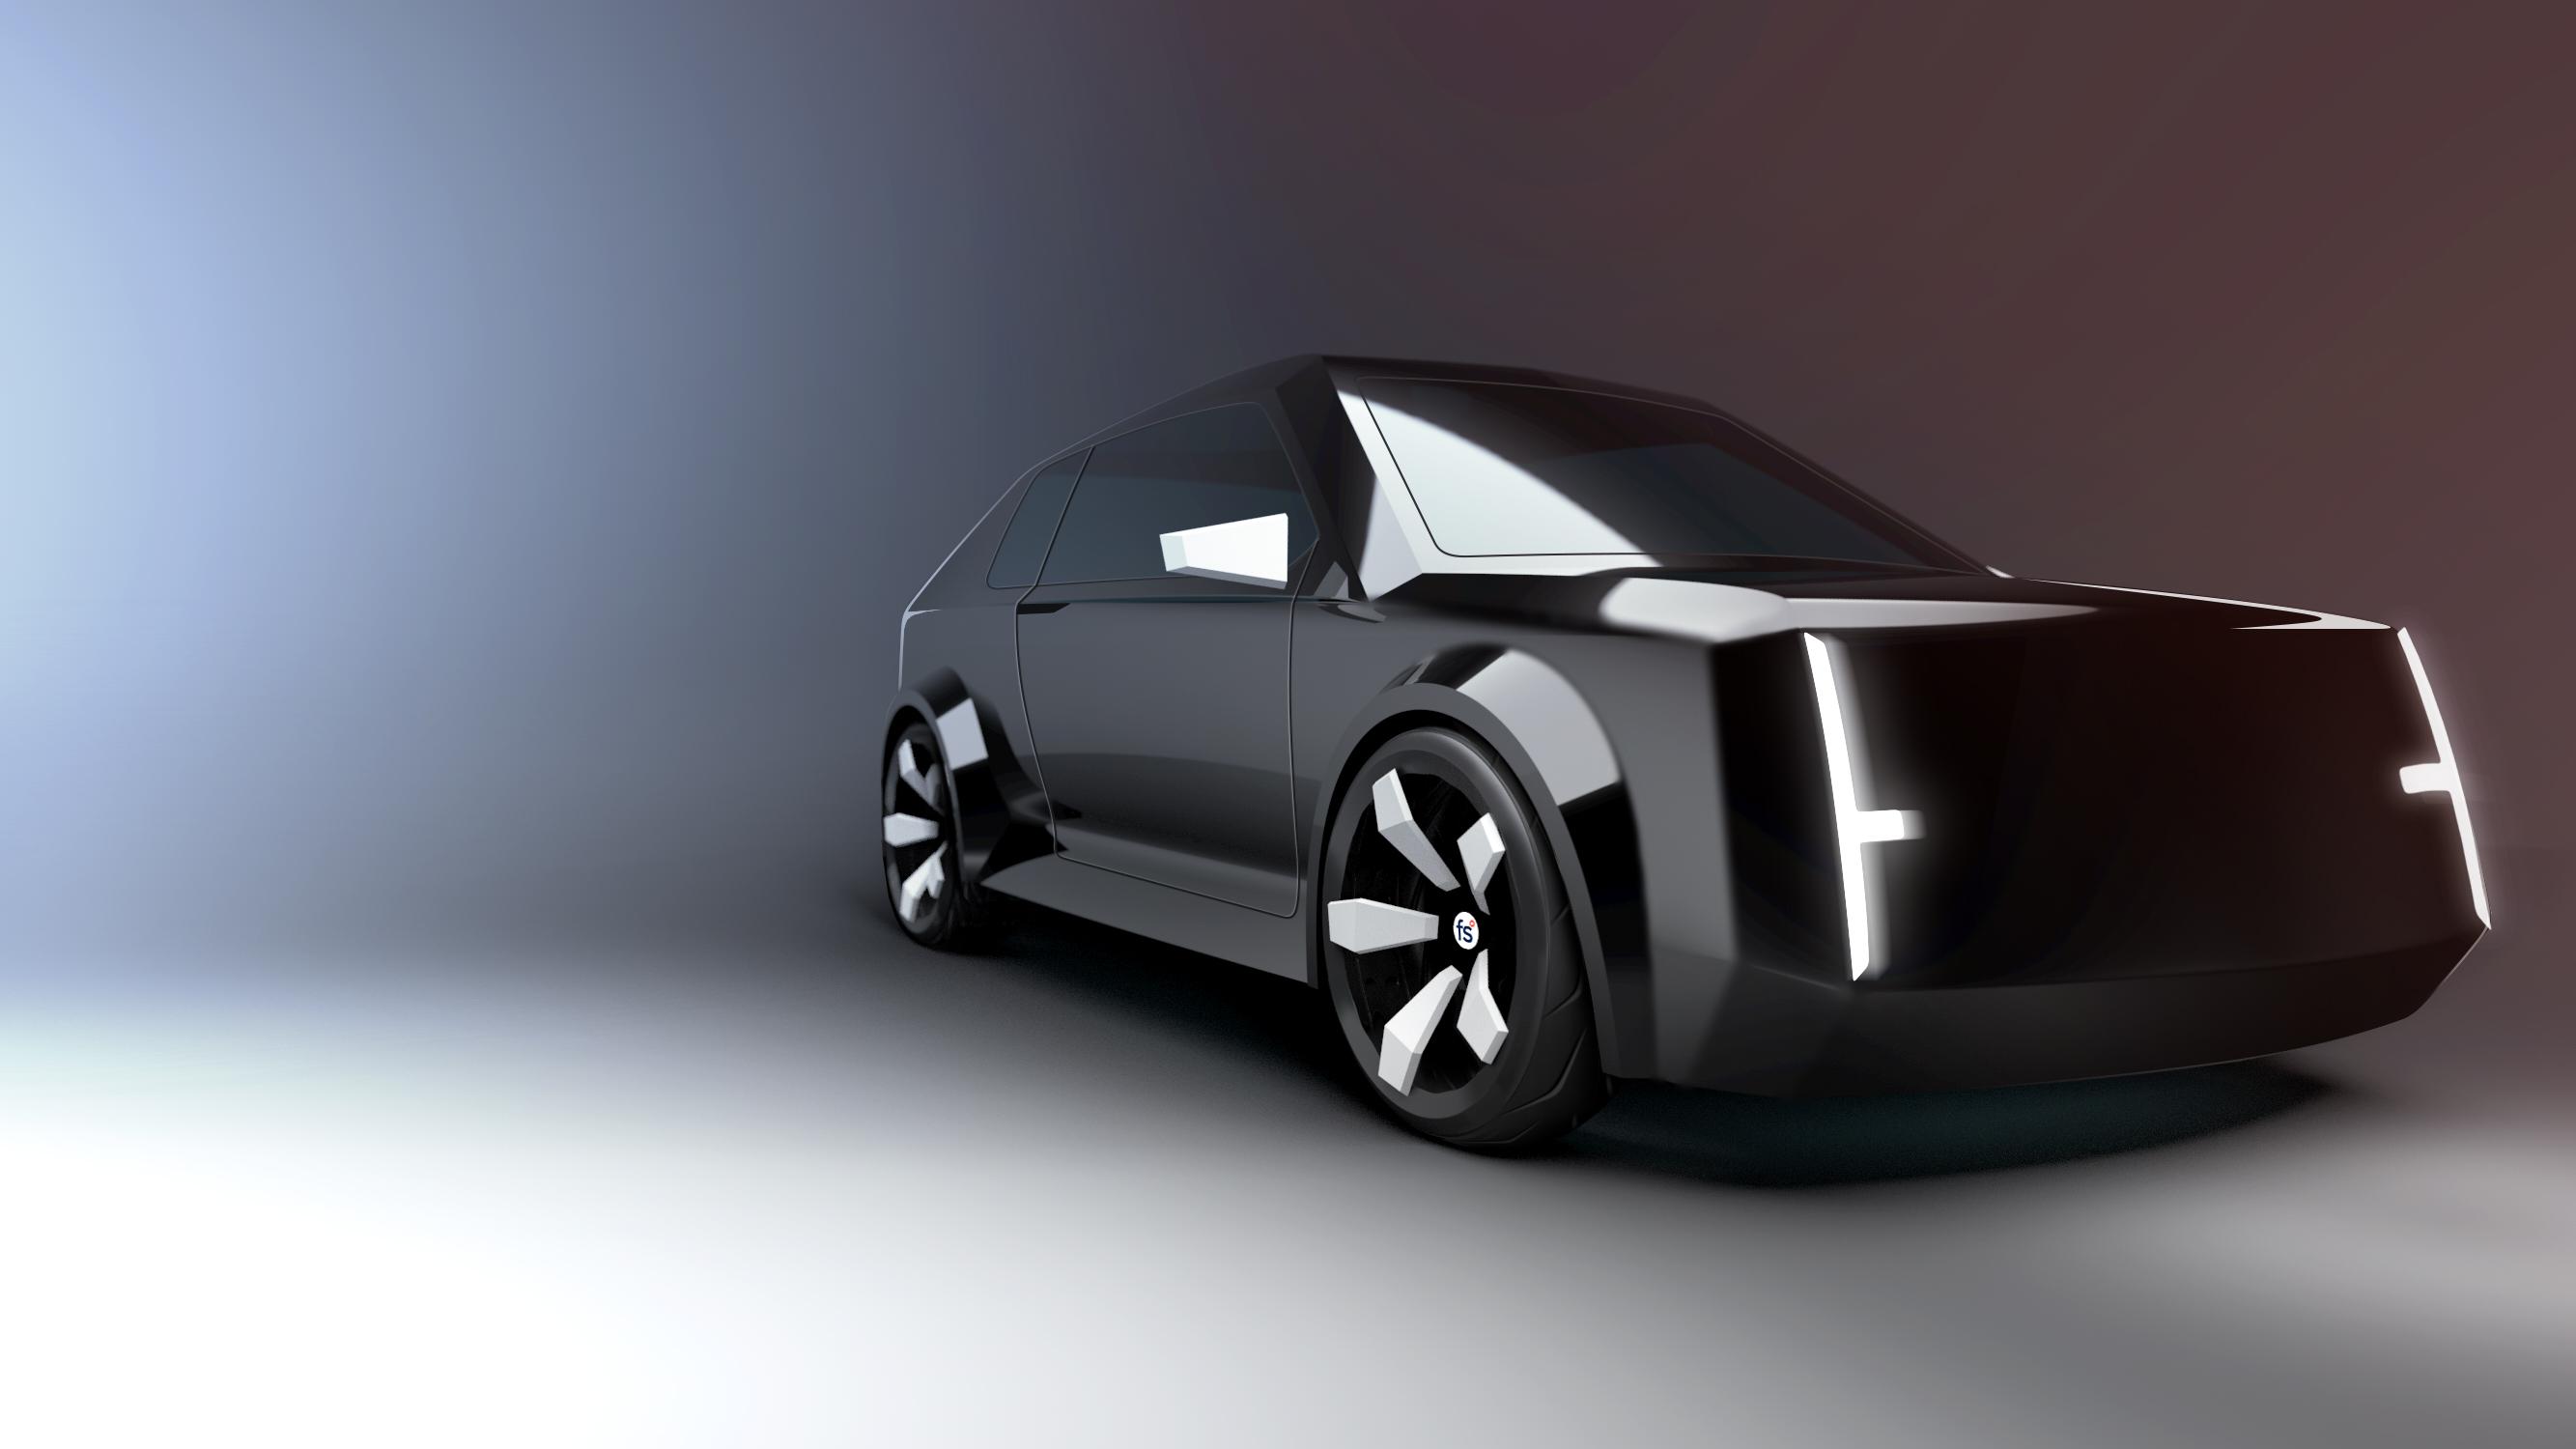 SUV modeled in flyingshapes